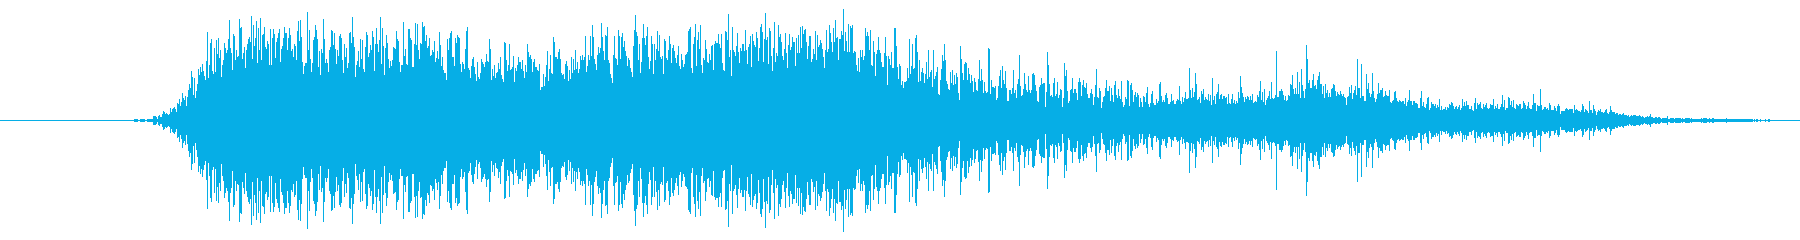 Raspy Growl 6の再生済みの波形